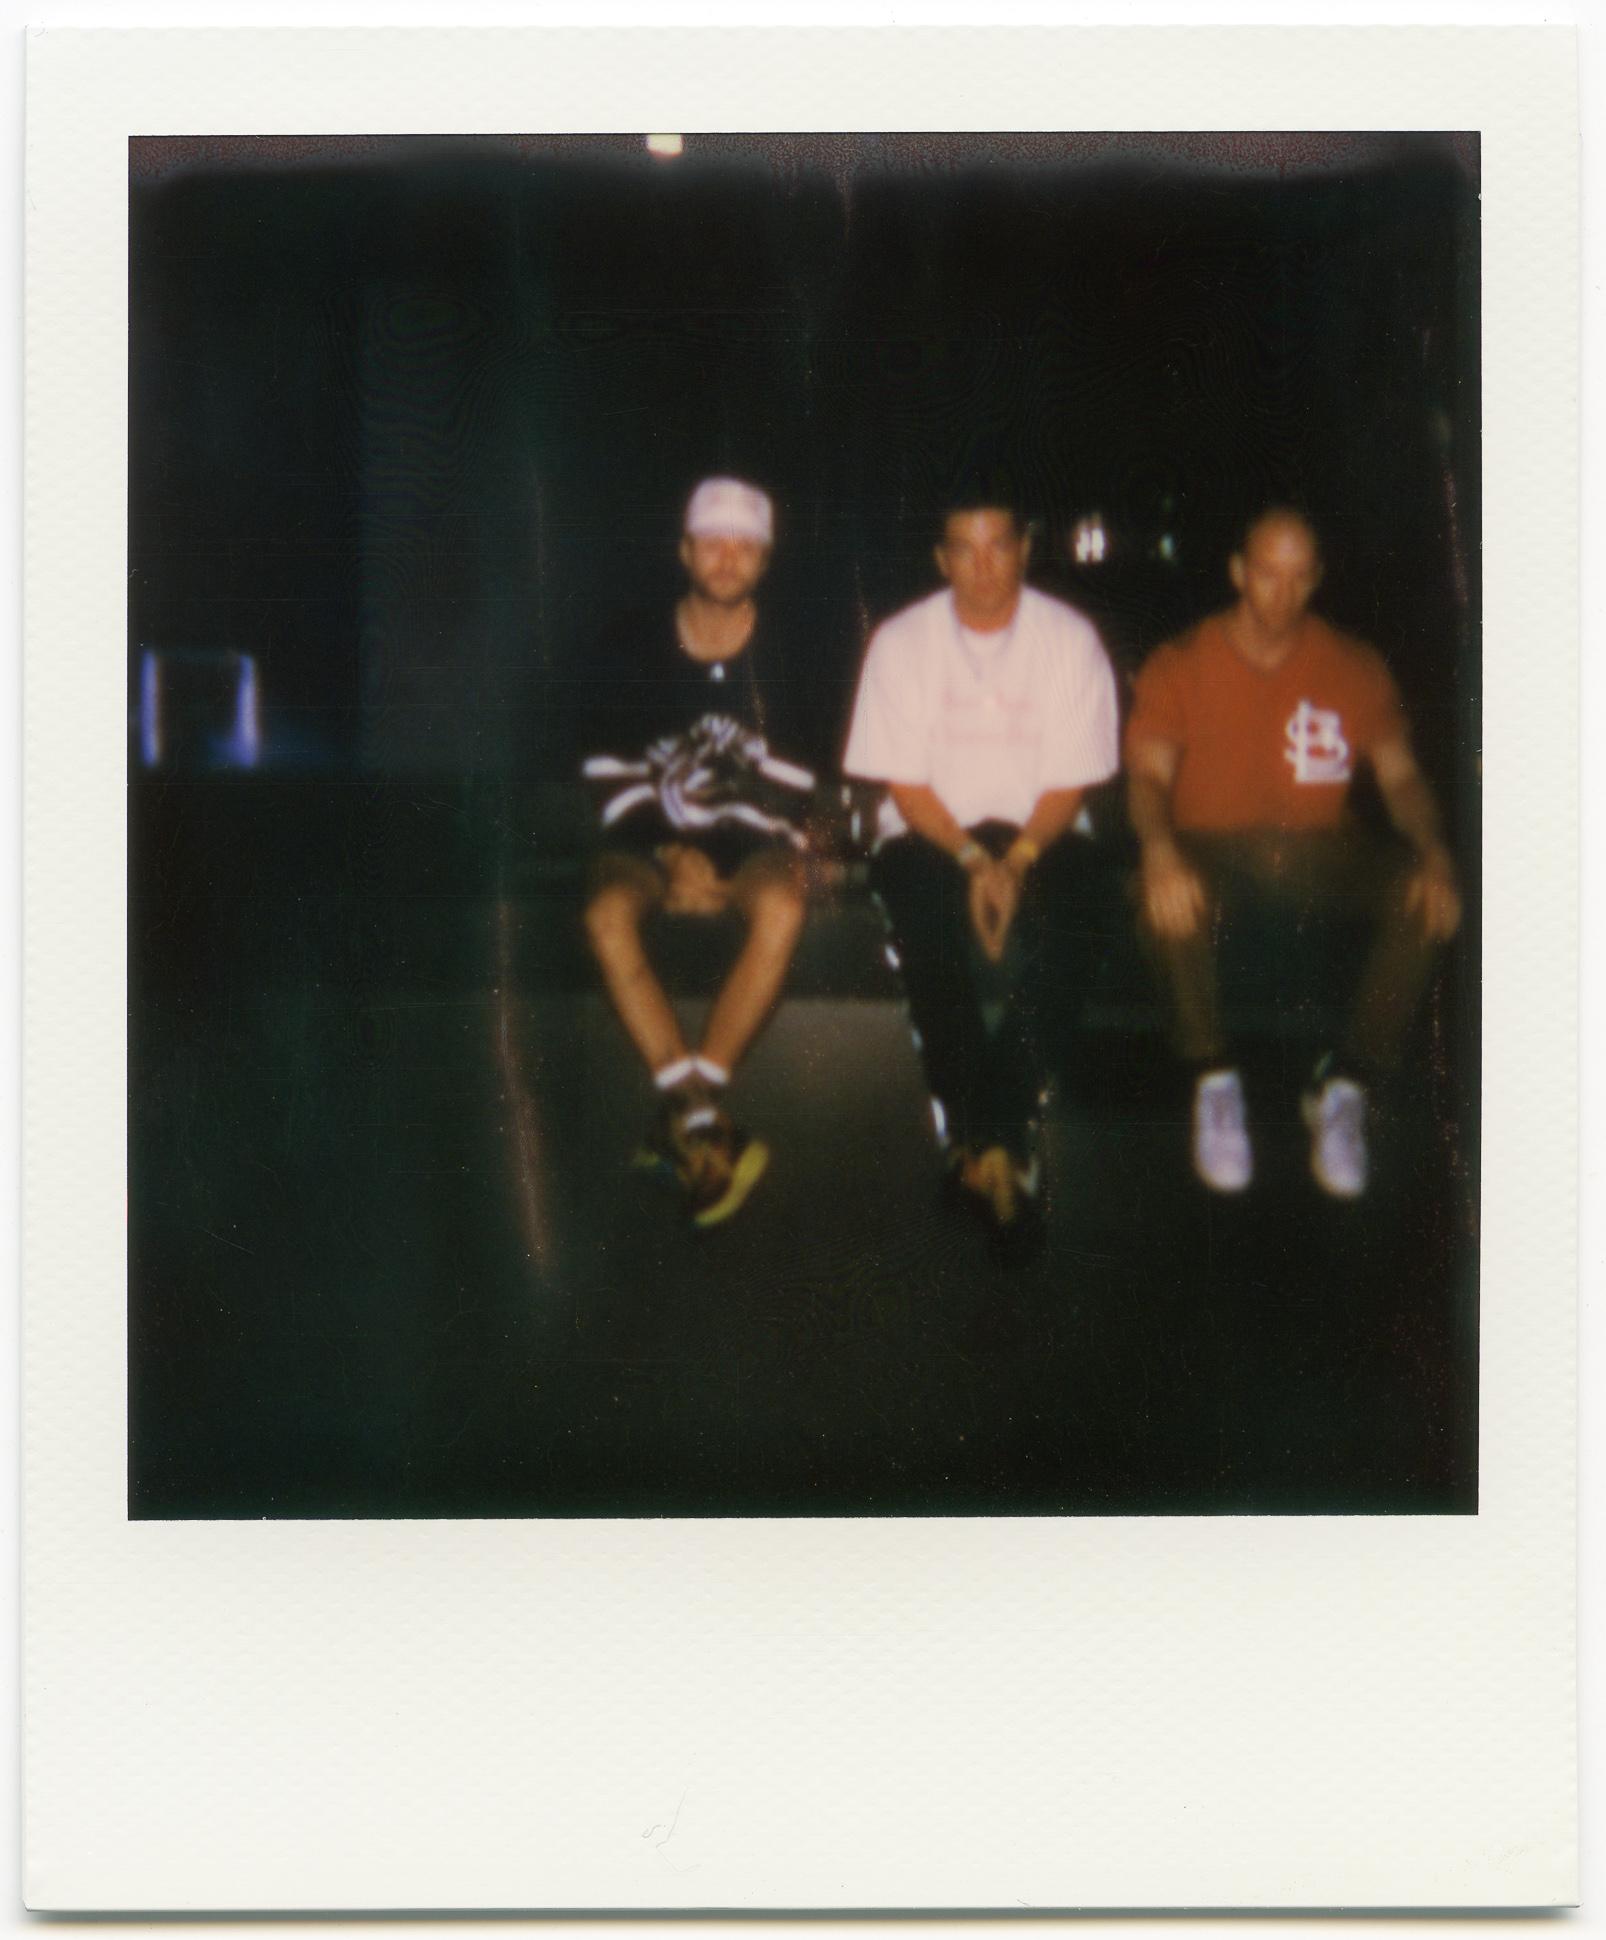 LANY-Polaroid-17-06-2019-Vancouver-7.jpg